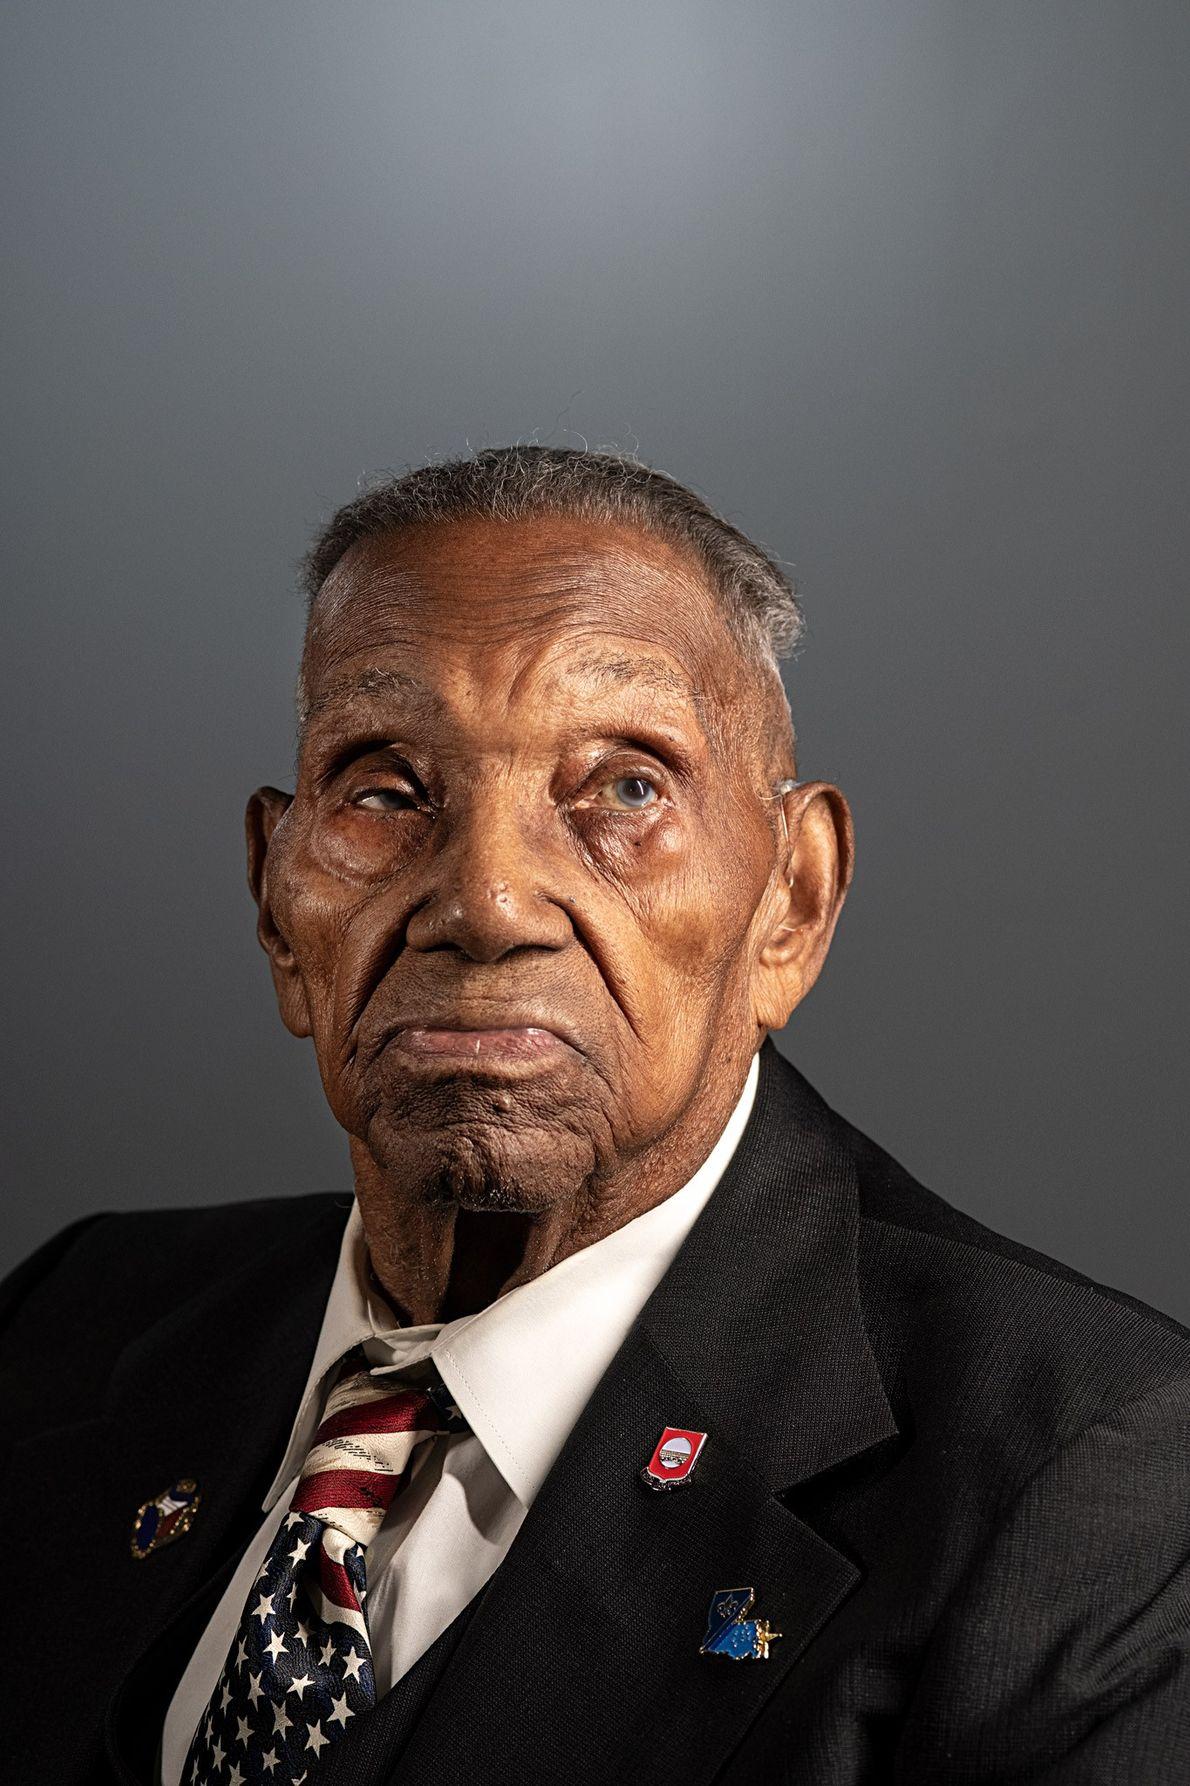 Lawrence Brooks, America's oldest known living veteran